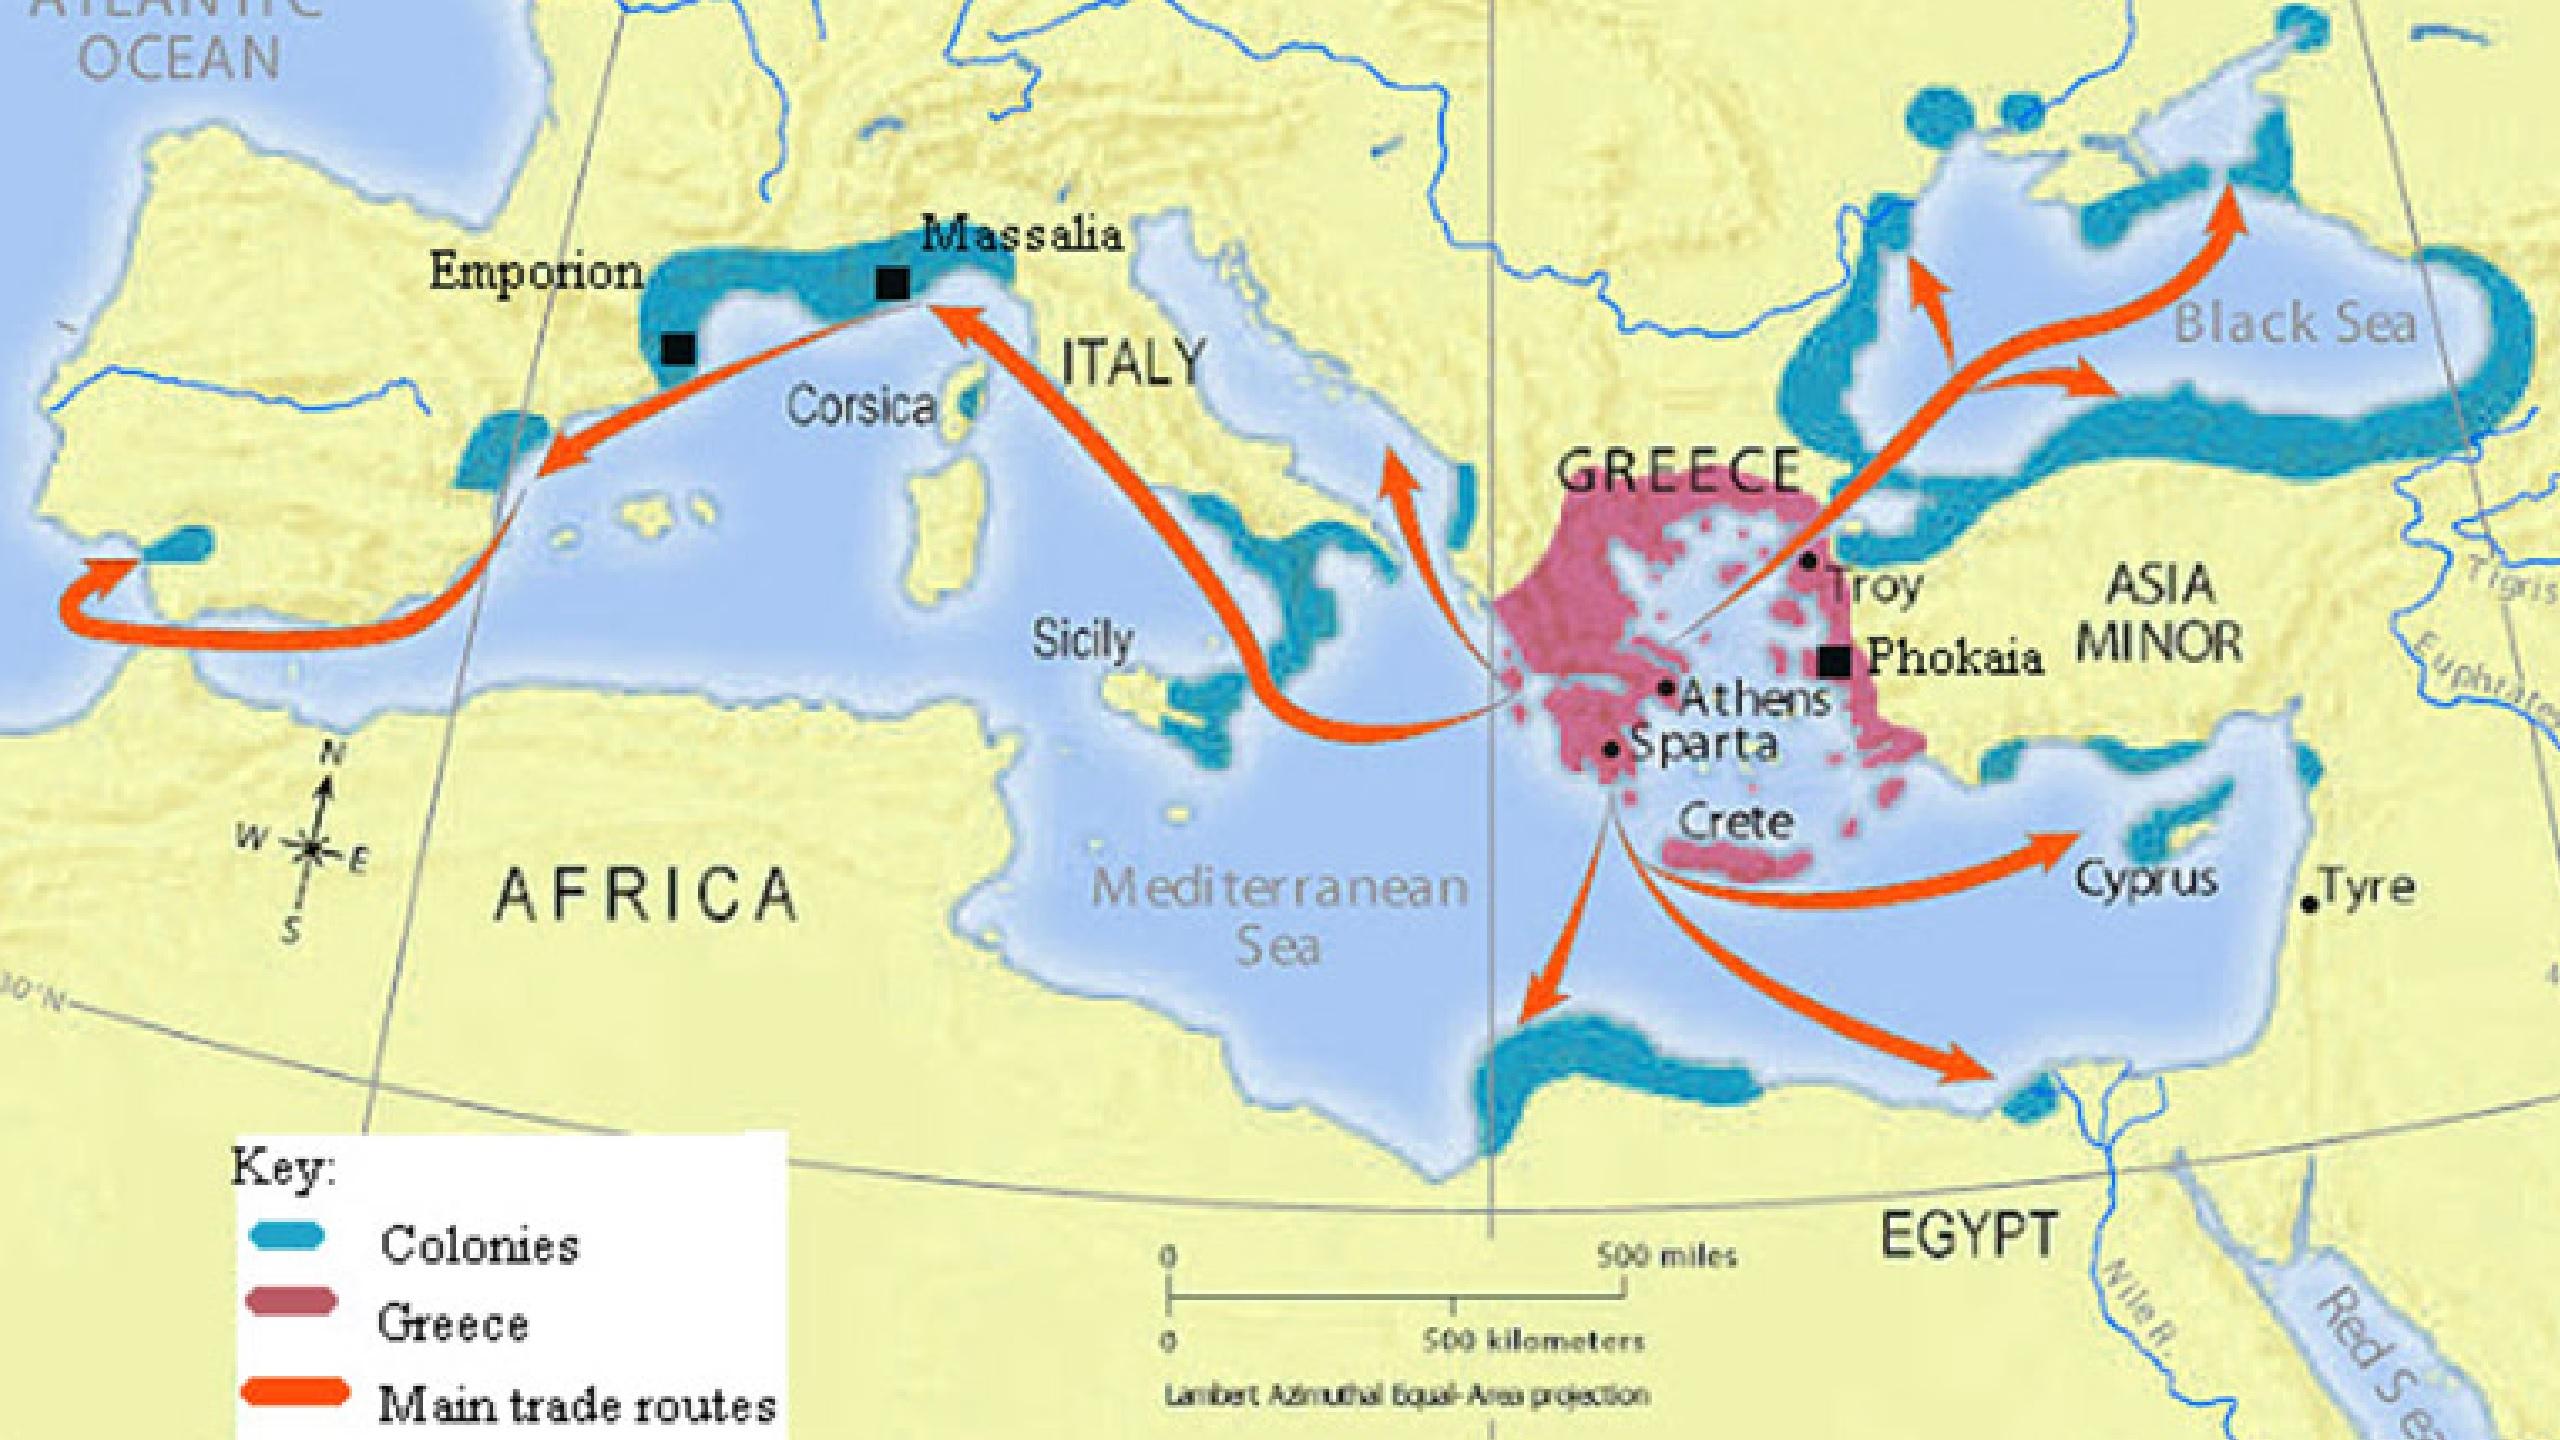 Overseas Colonies of Greek City-States